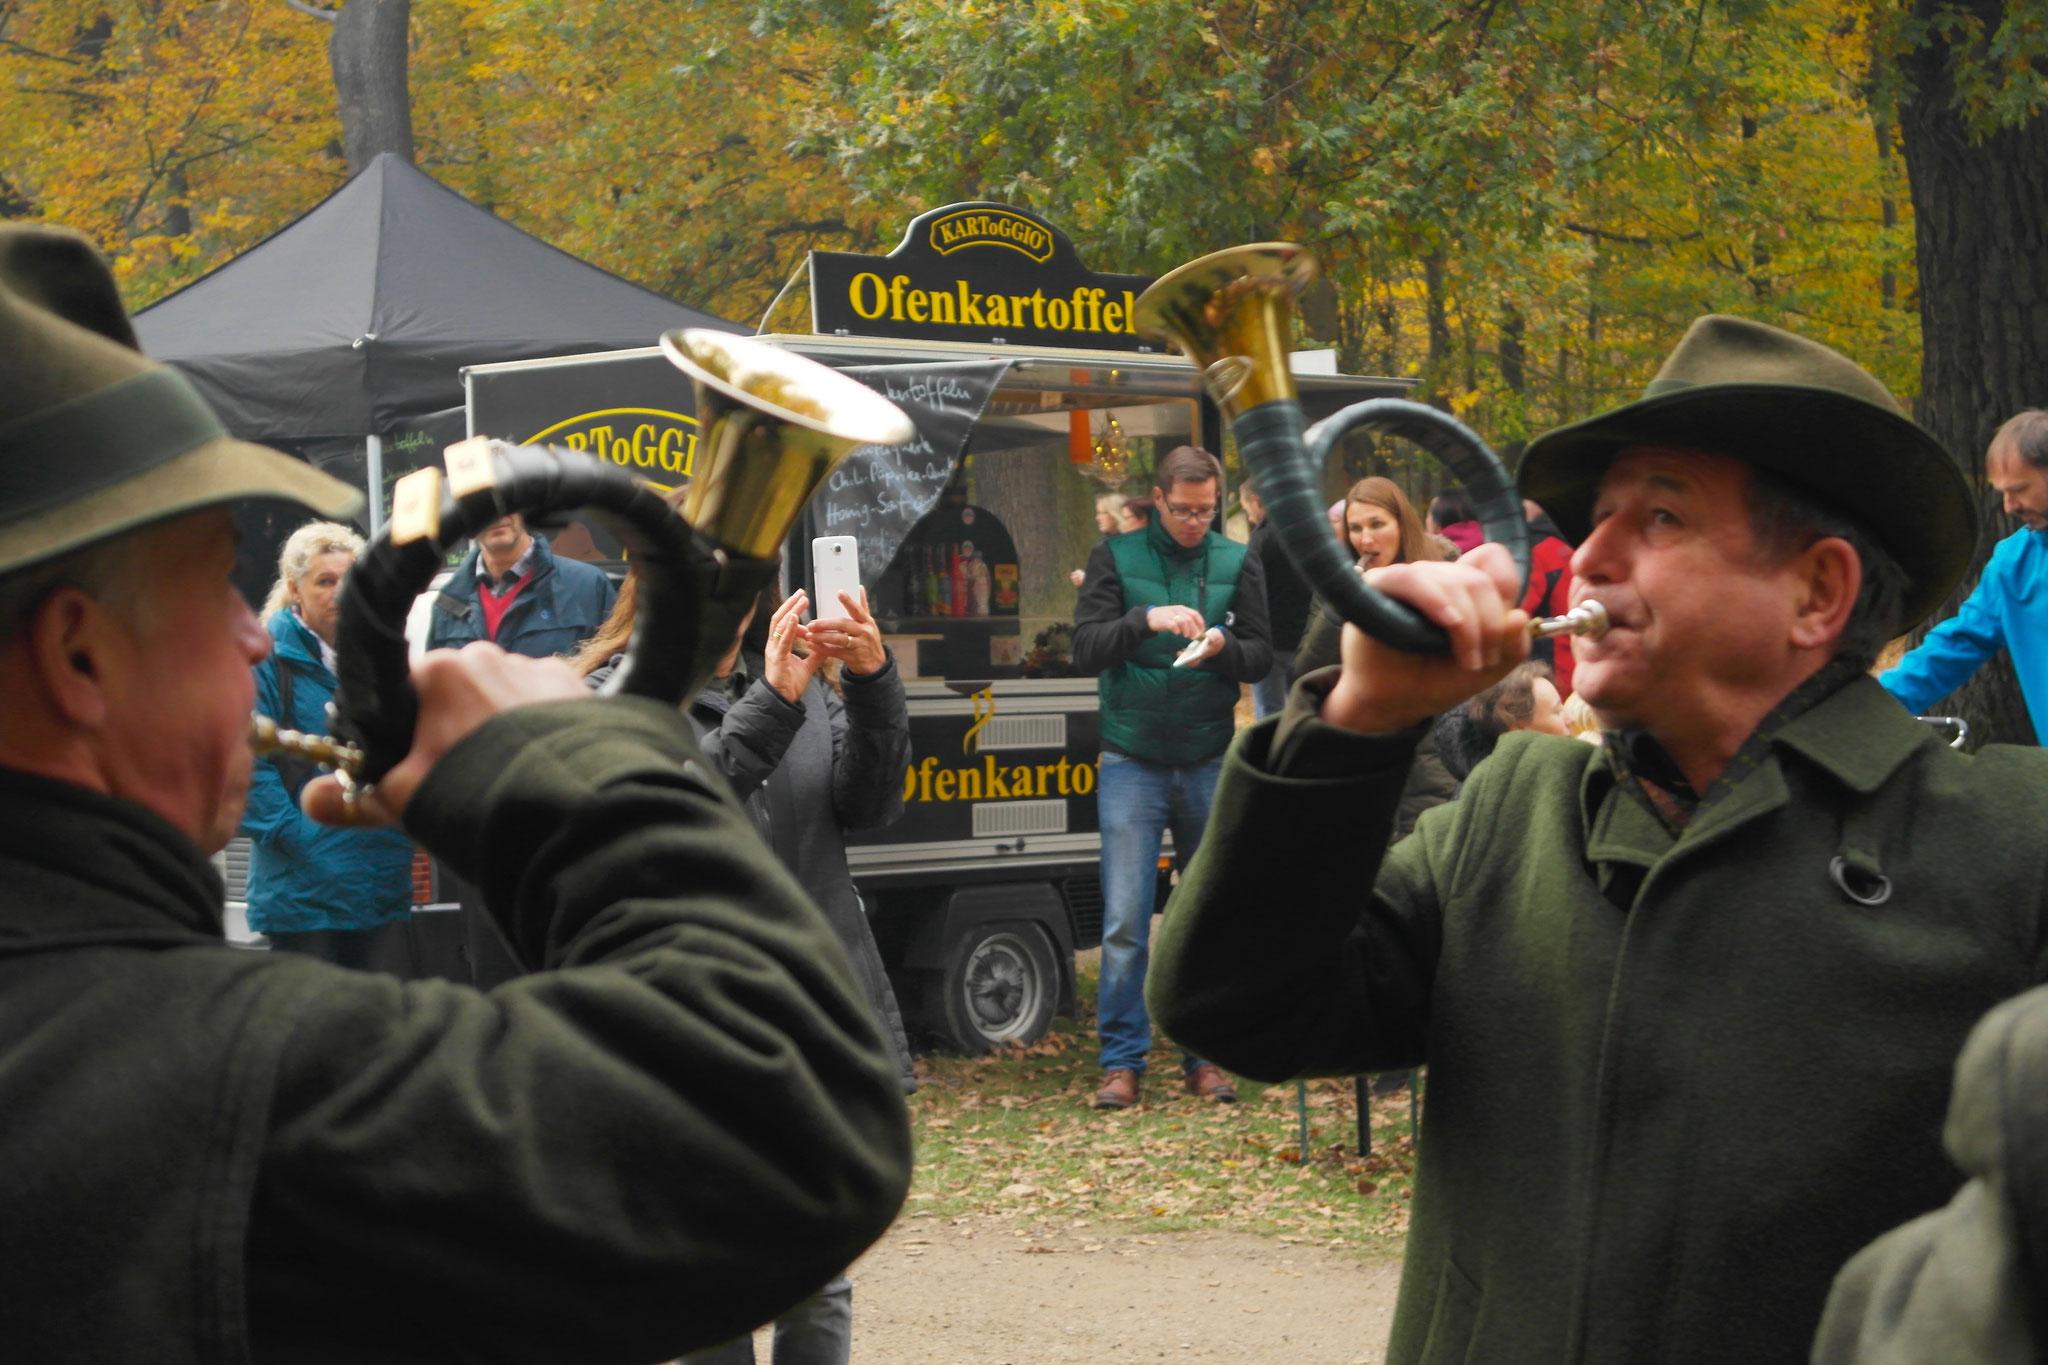 Waidmanns-Dank beim Hubertusfest im Jagdschloss Springe